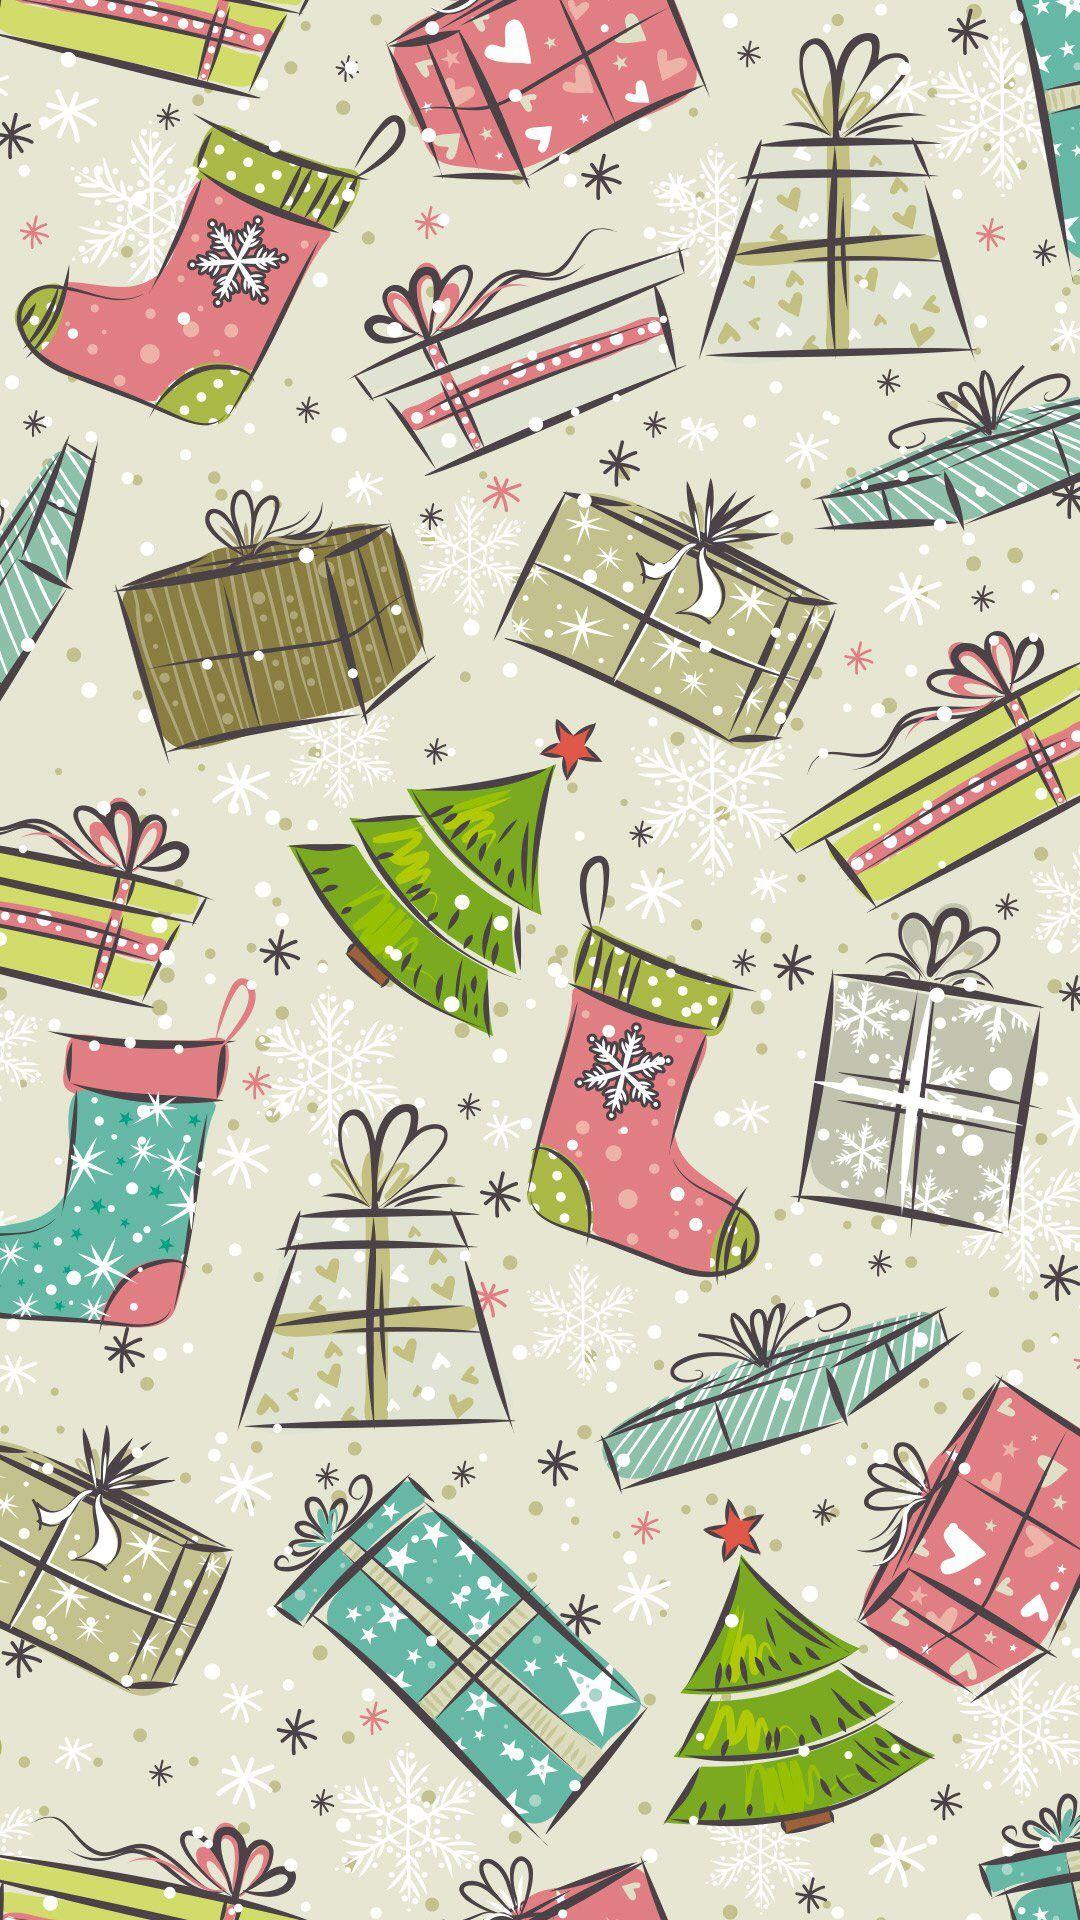 Happy Holidays Wallpaper Iphone Christmas Cute Christmas